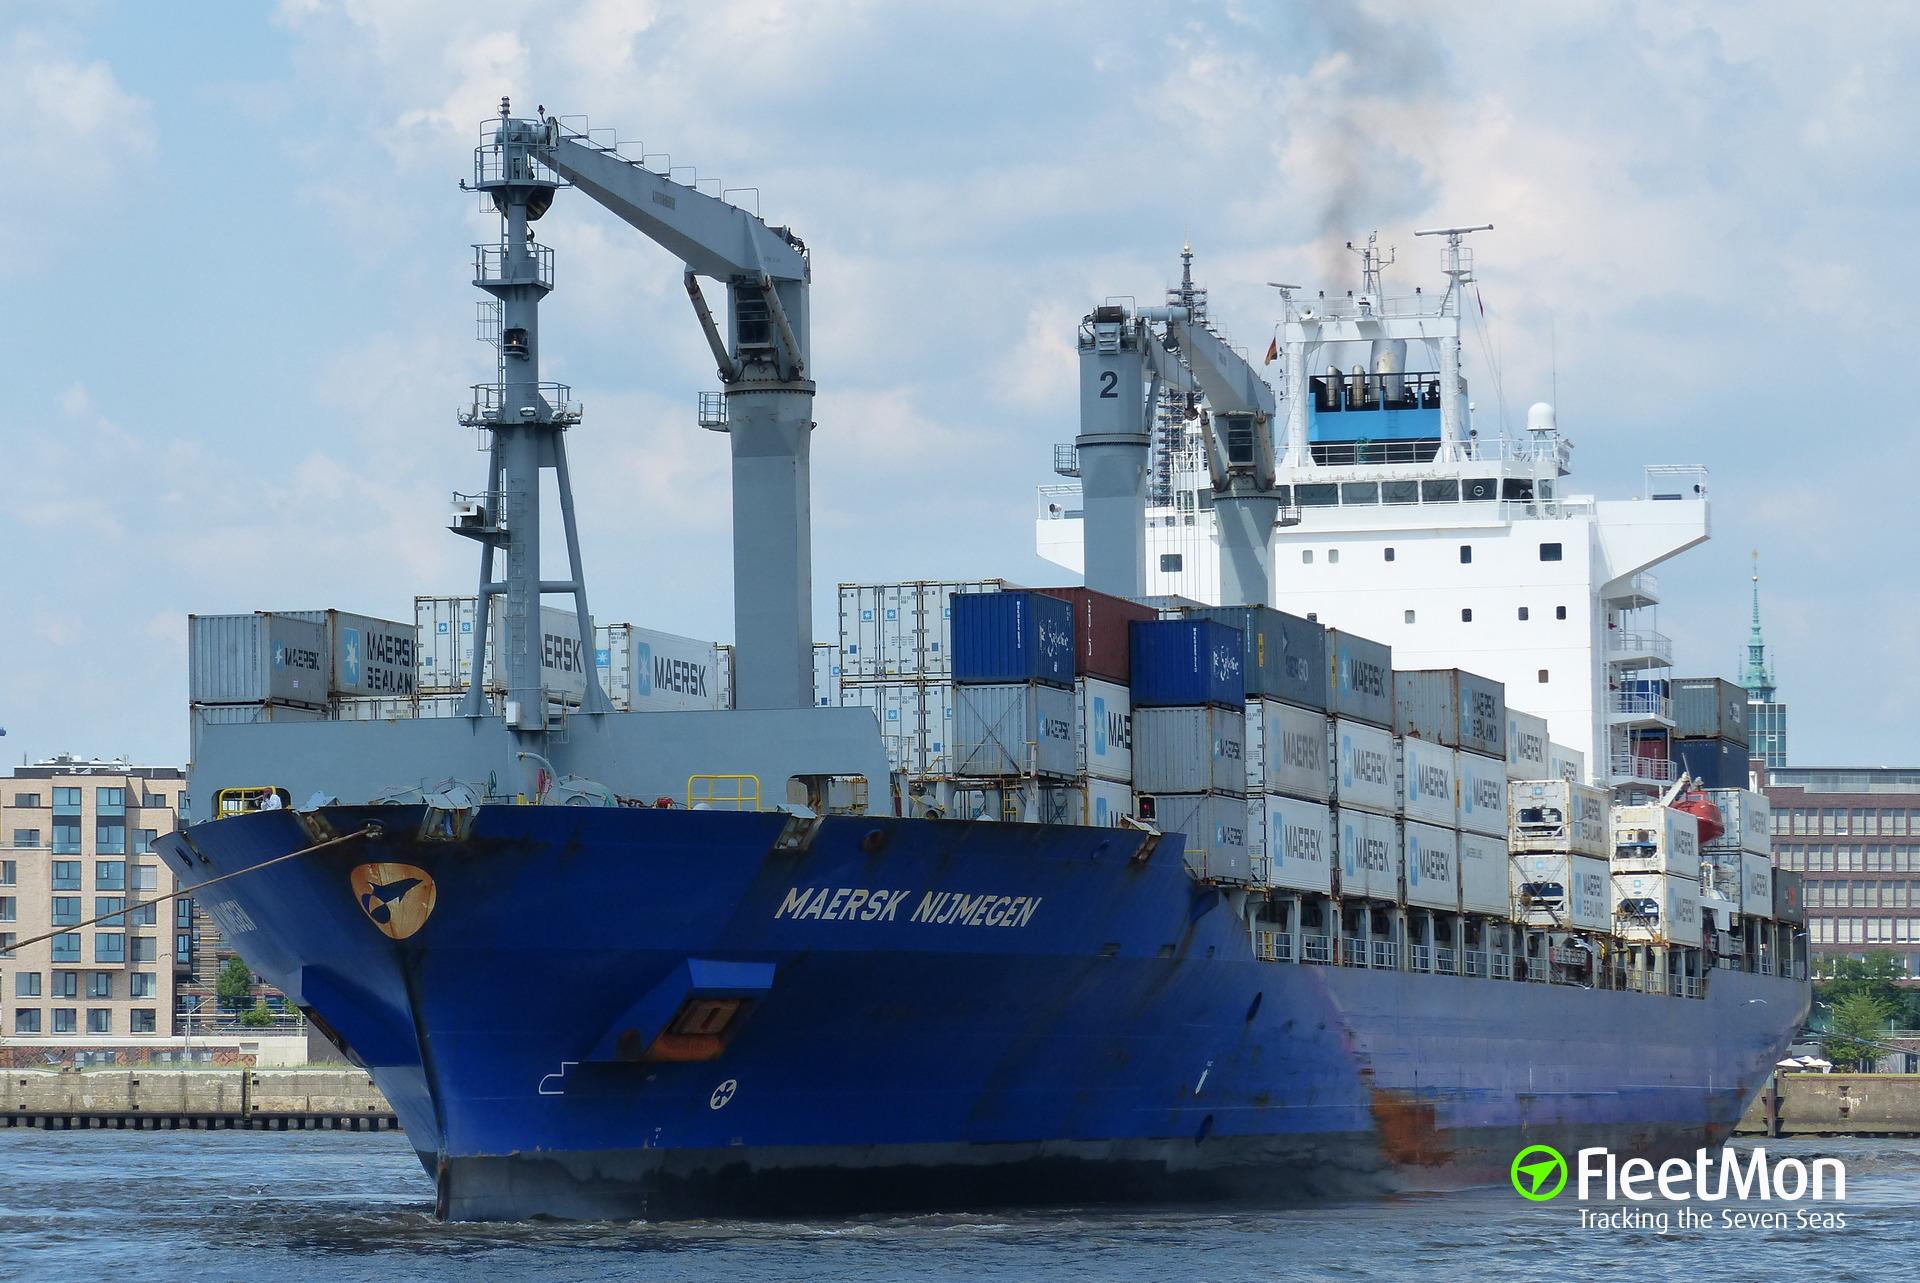 MAERSK NIJMEGEN Captain medevac, Azores